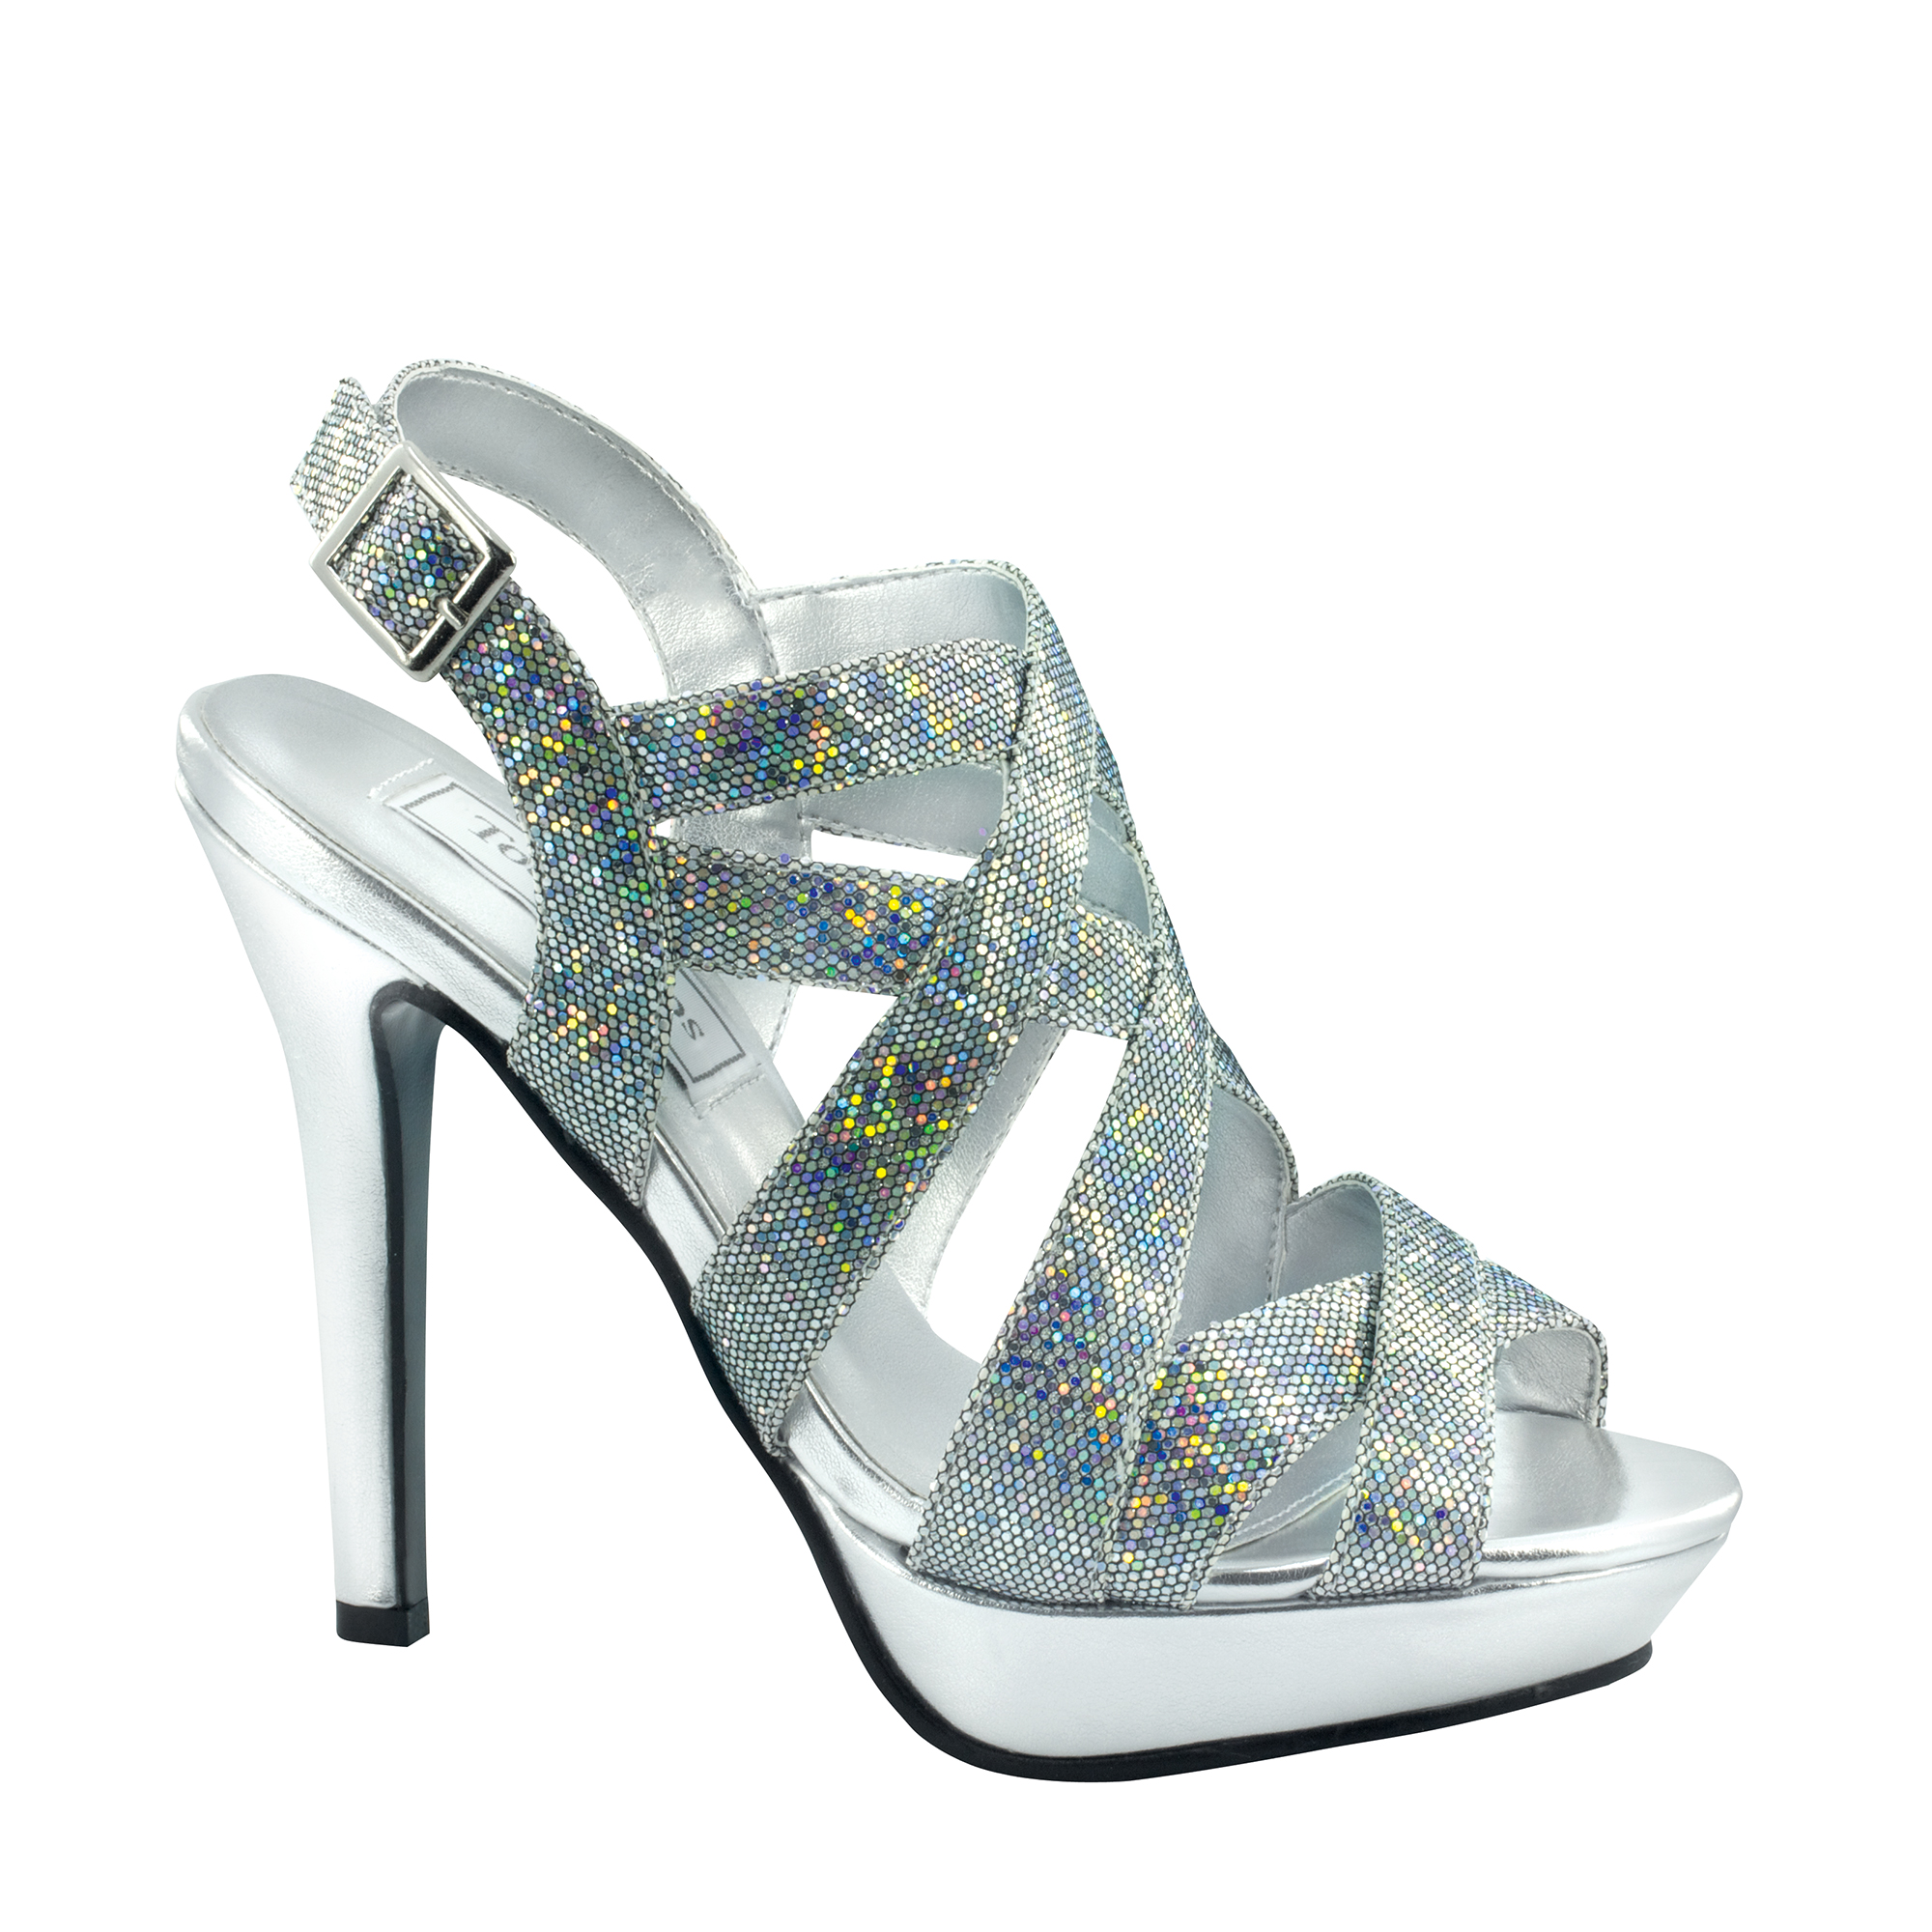 Touch Ups Womens Rita Platform Sandal,Silver Iridescent,6.5 M US